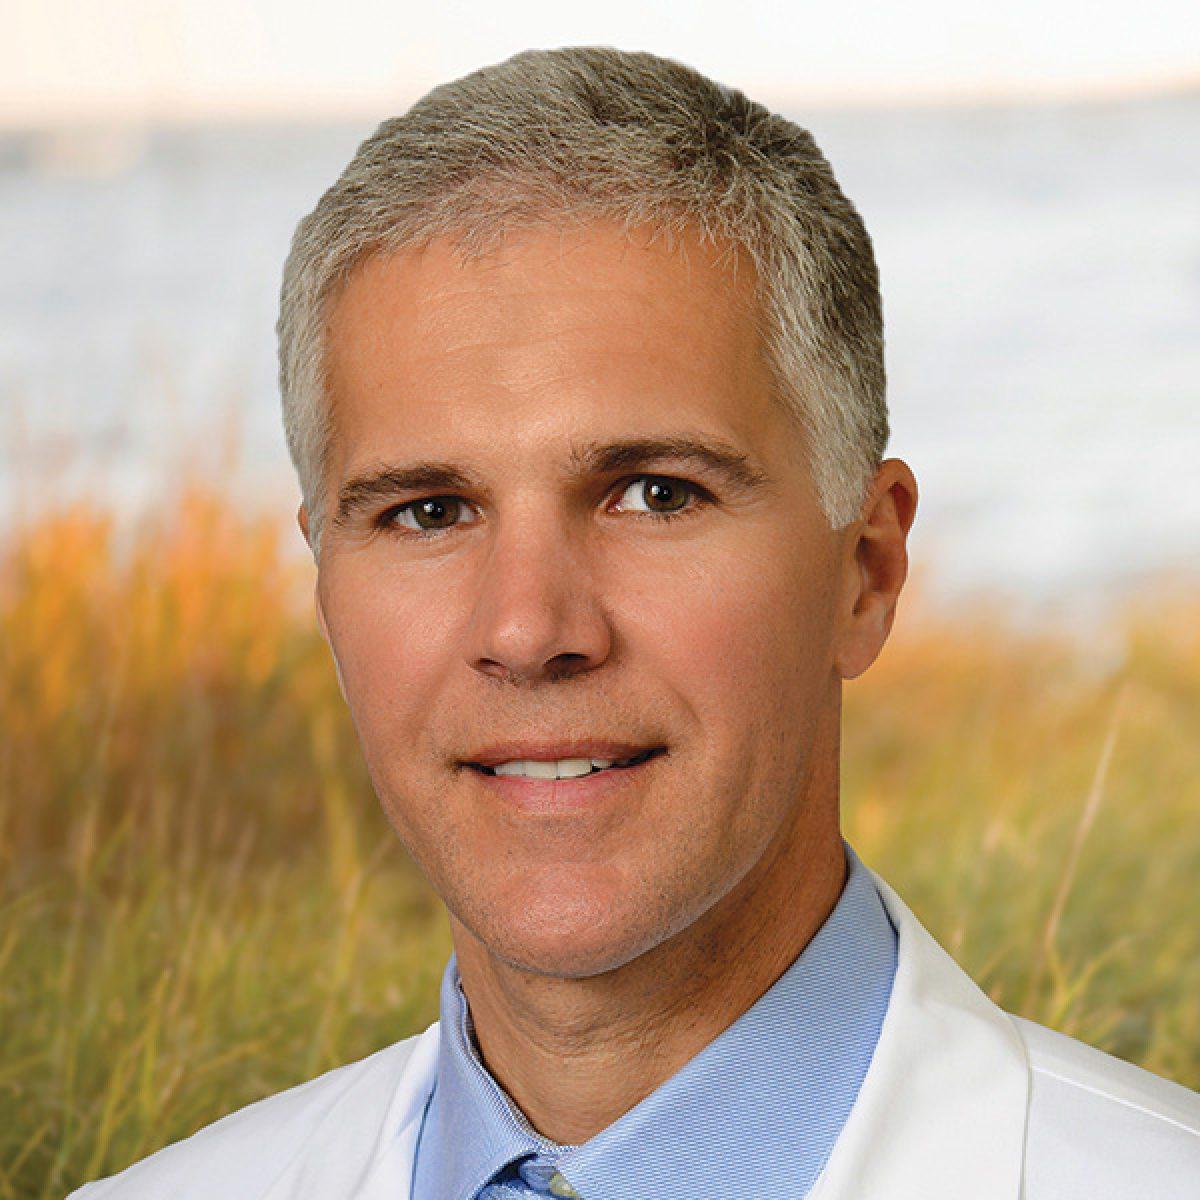 George T. Salloum, MD